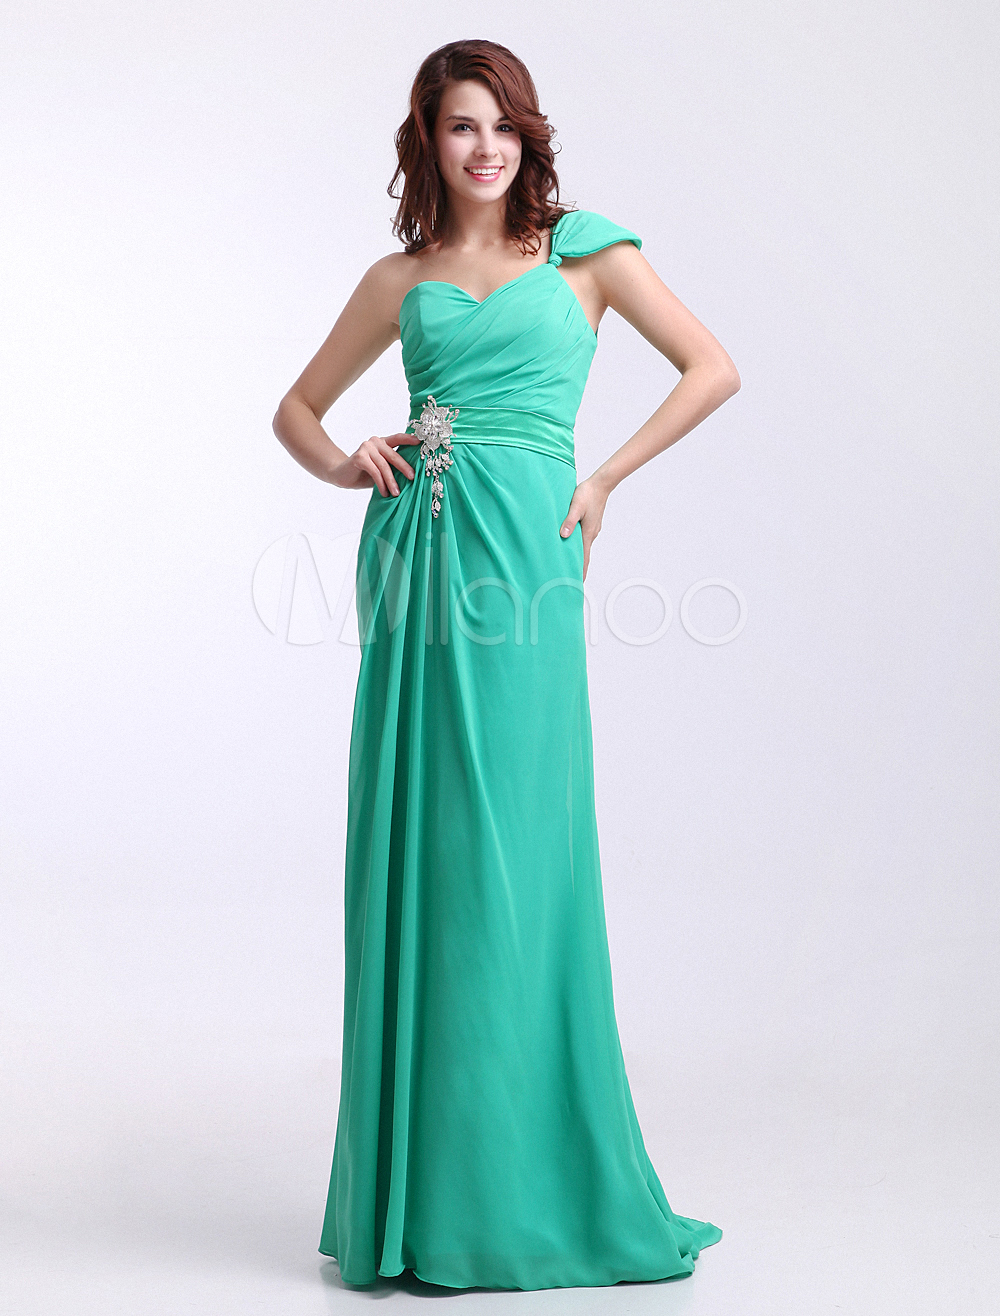 Forest Green Chiffon One Shoulder Side Draped Bridesmaid Dress Milanoo (Wedding Bridesmaid Dresses) photo